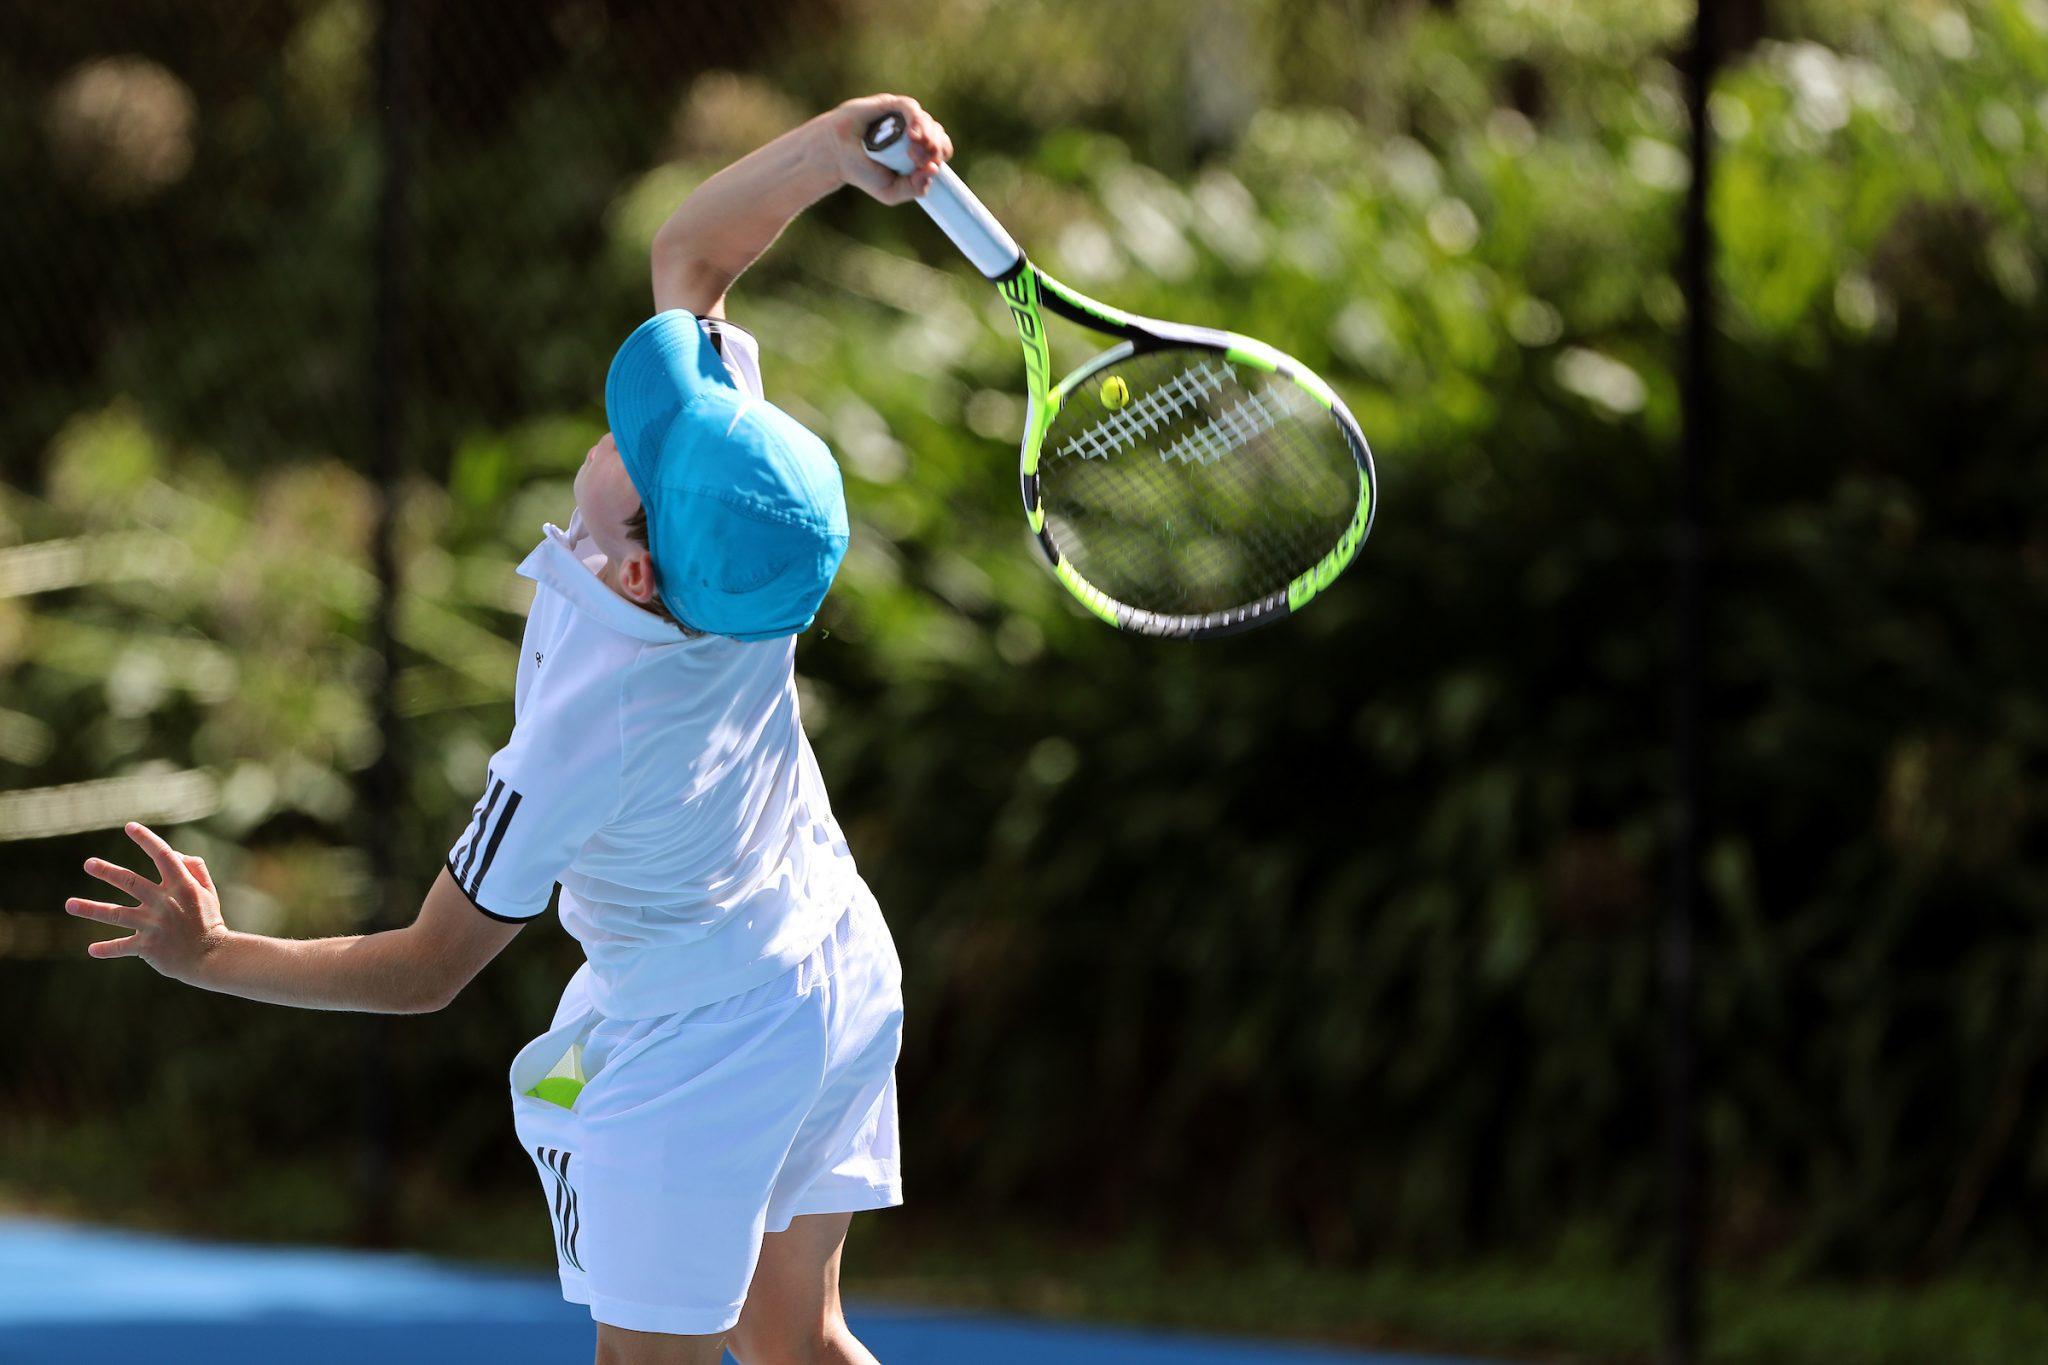 Tremendous Turnout for Autumn Junior Tournament